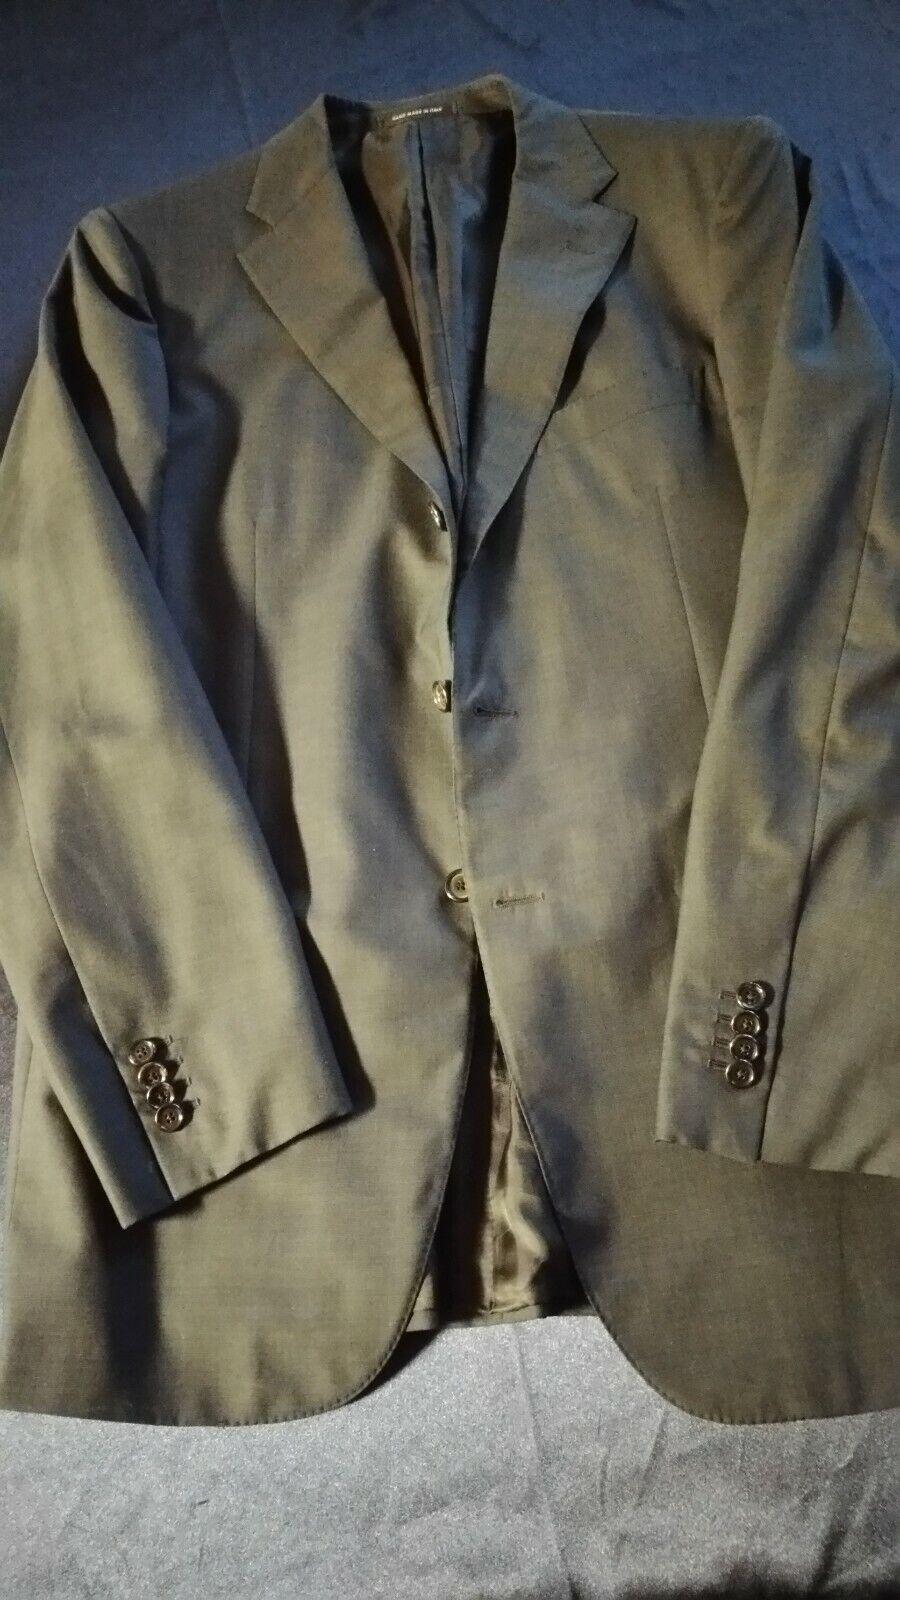 Caruso Anzug dunkelblau Gr. 52  7L 2-3 Knopf rollend, Hose